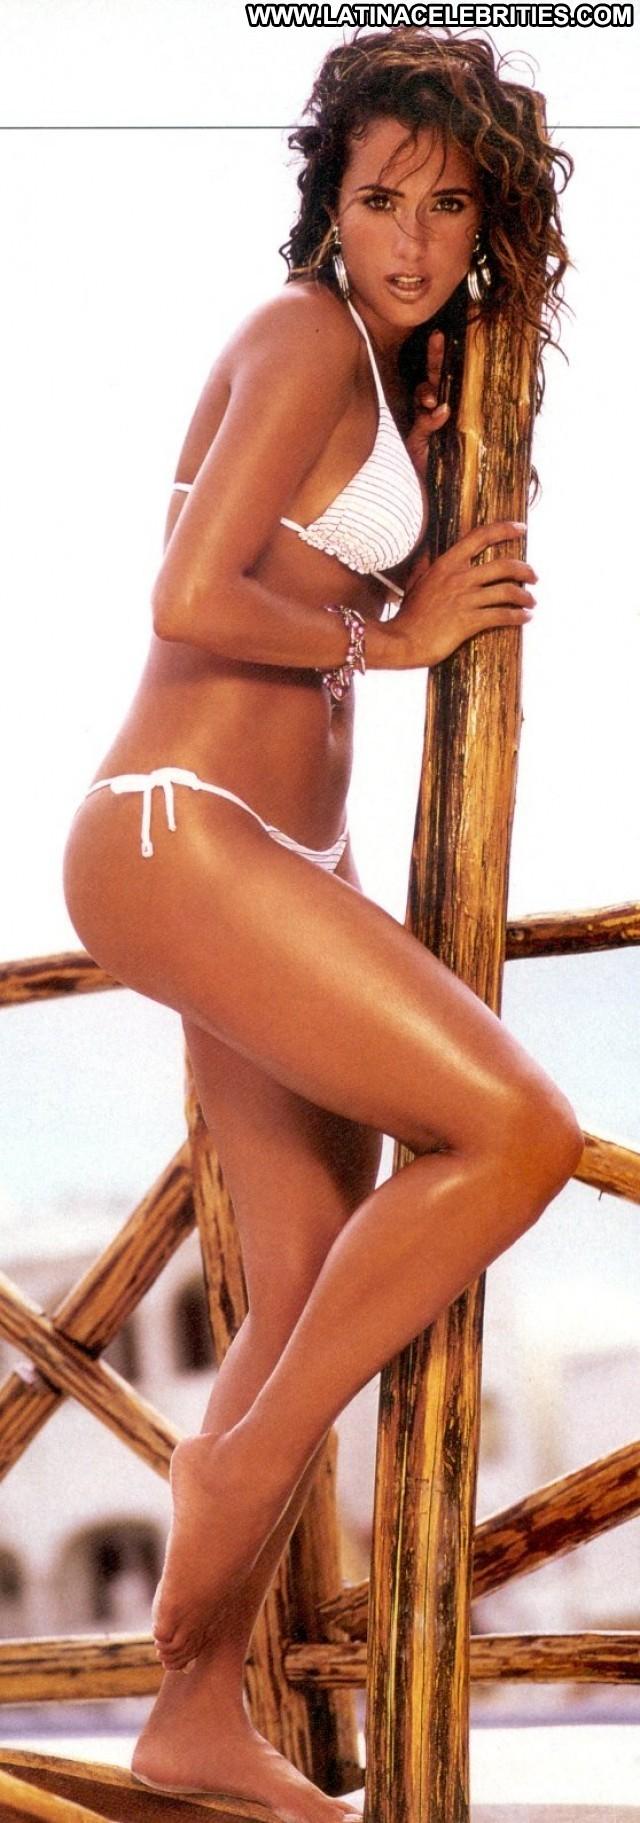 Betty Monroe Miscellaneous Gorgeous Latina Sensual Celebrity Stunning